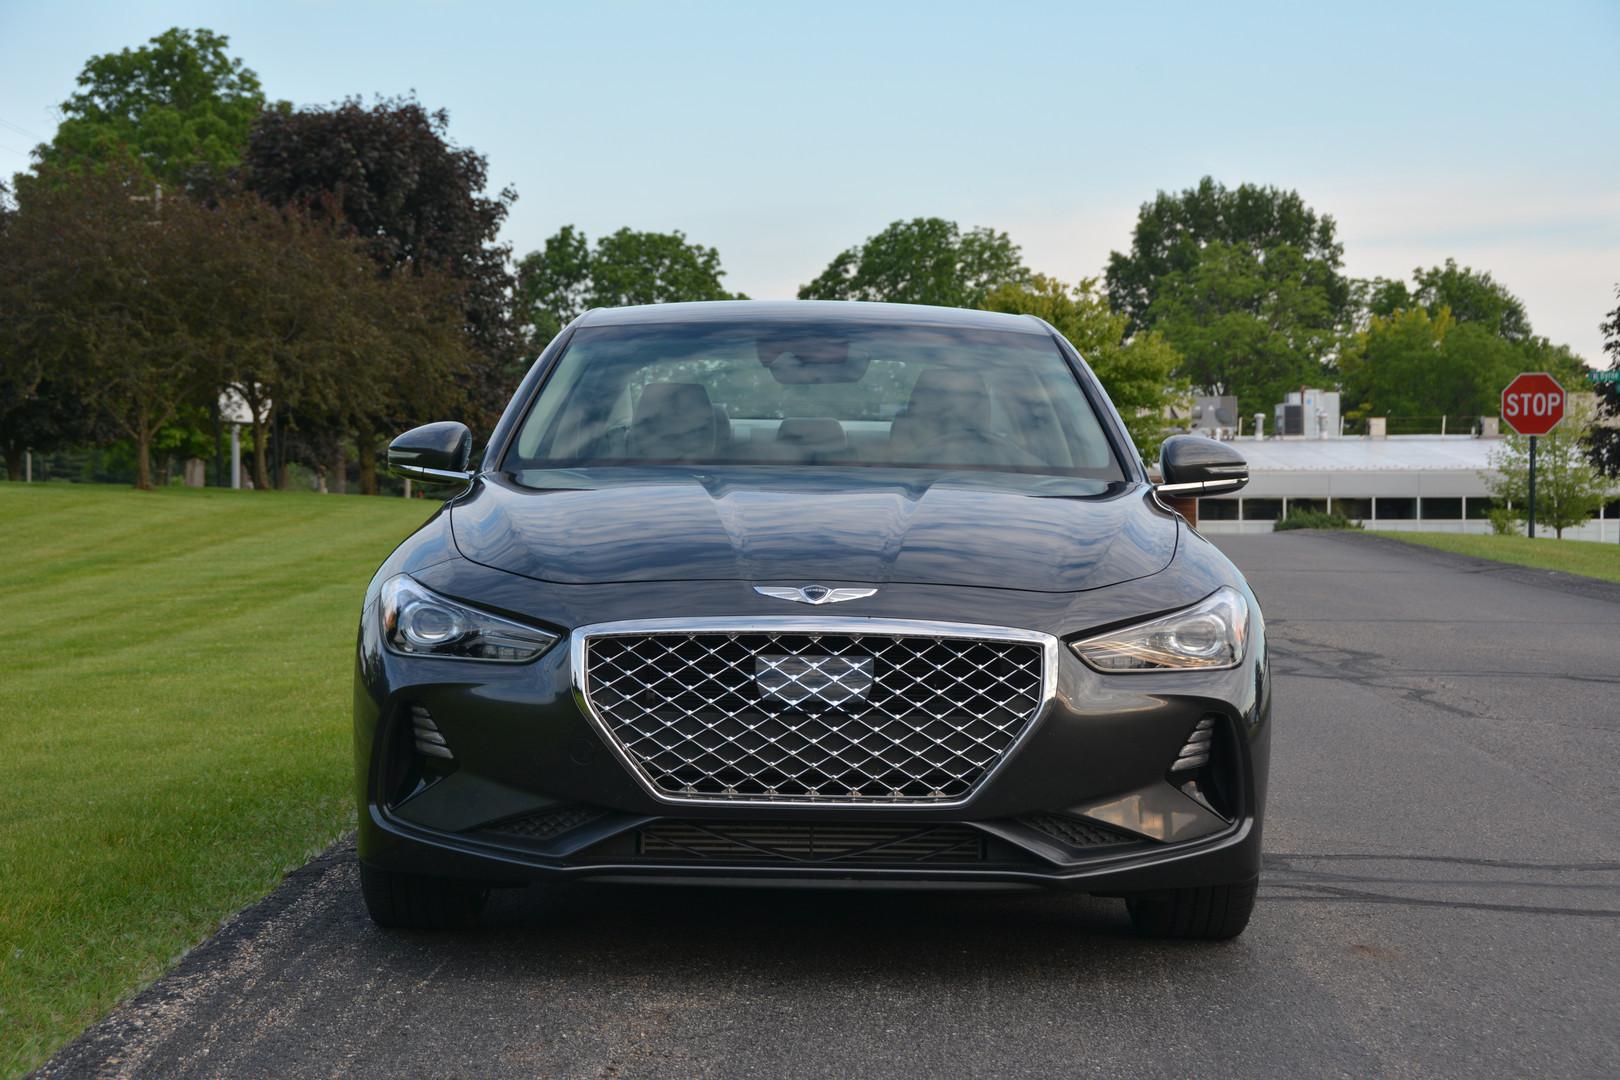 2019 Genesis G70 Front